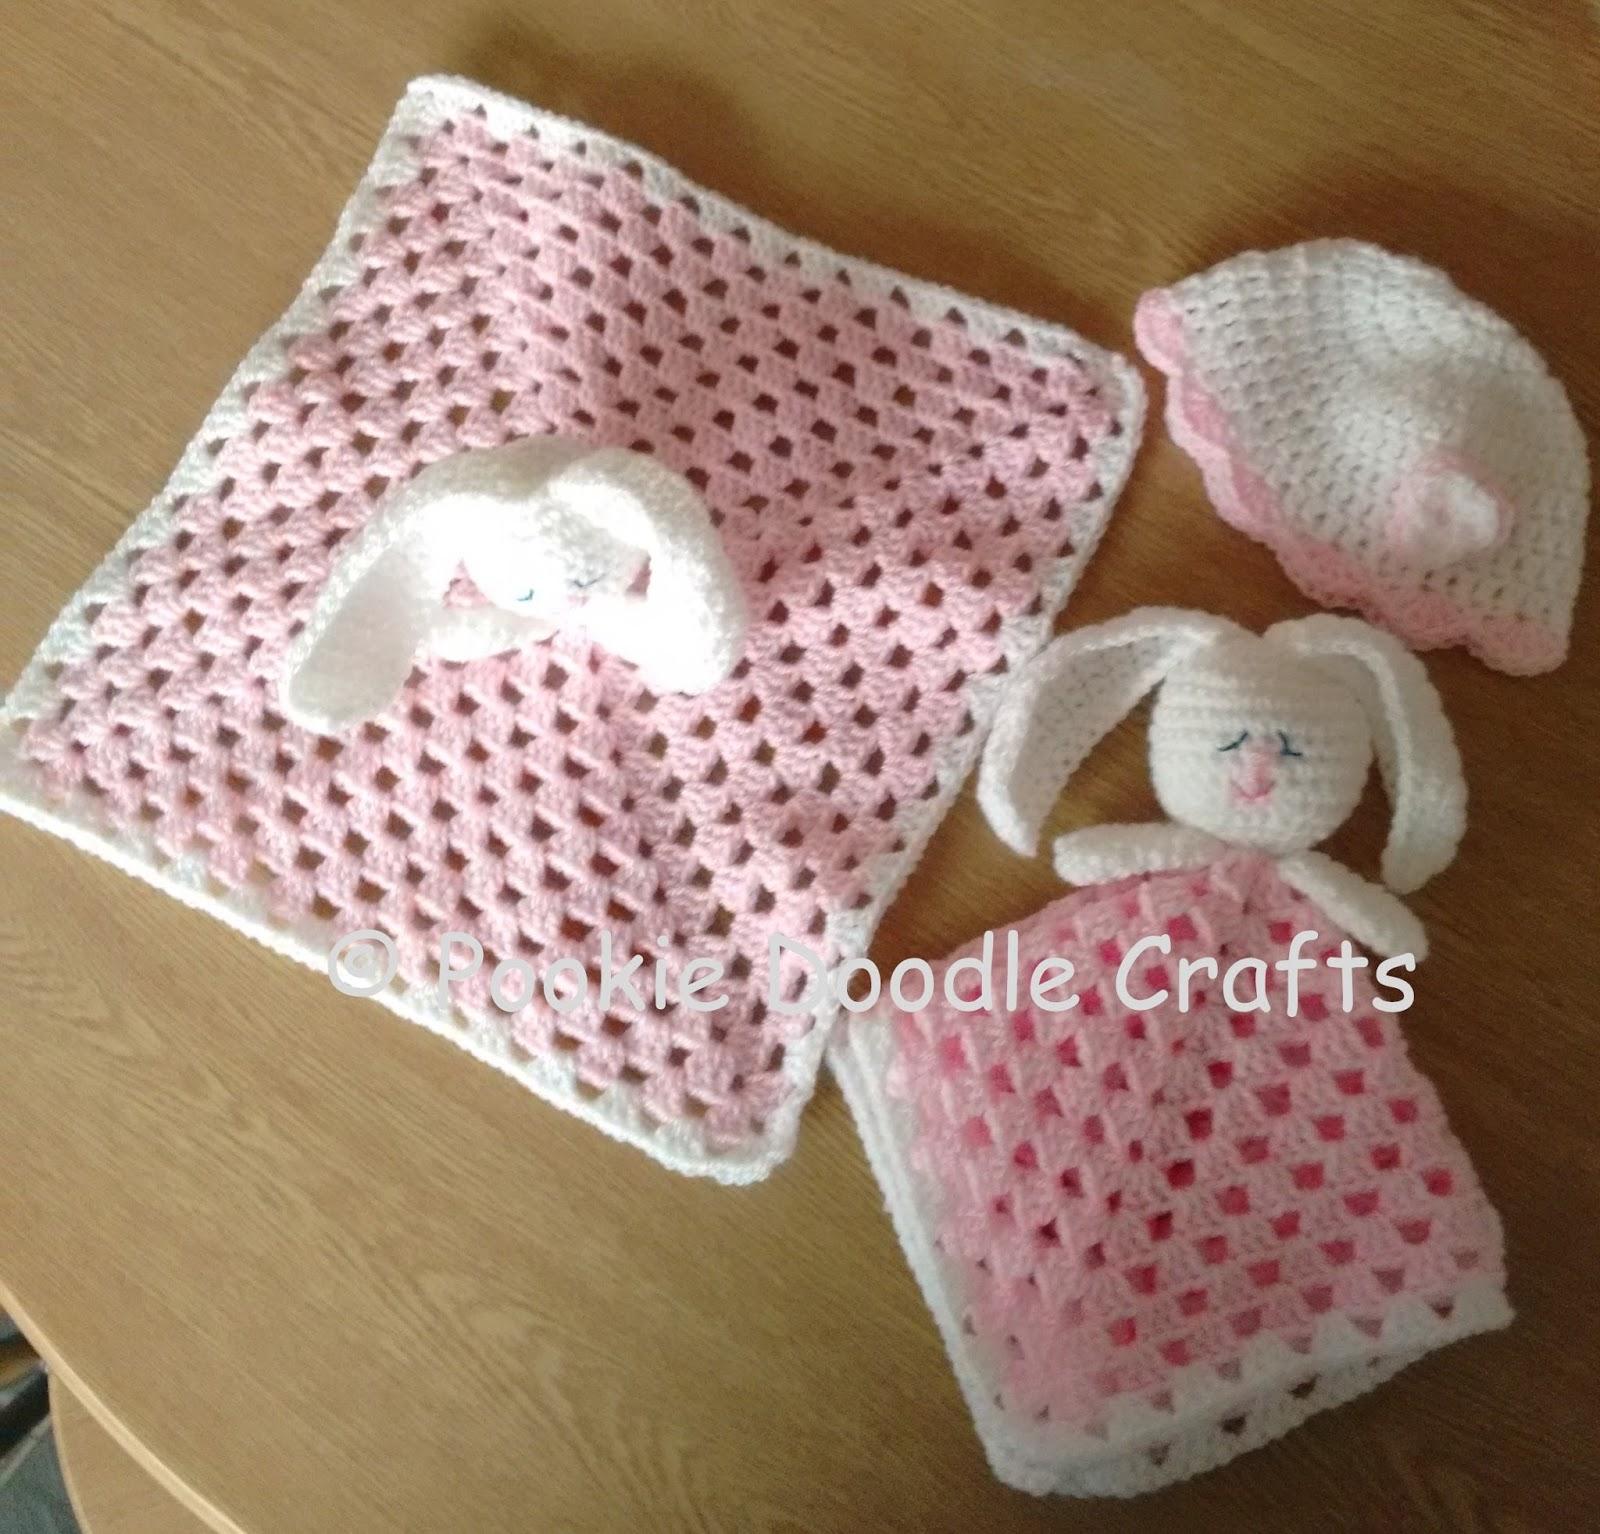 Crochet Baby Comforter Rabbit Toy And Hat